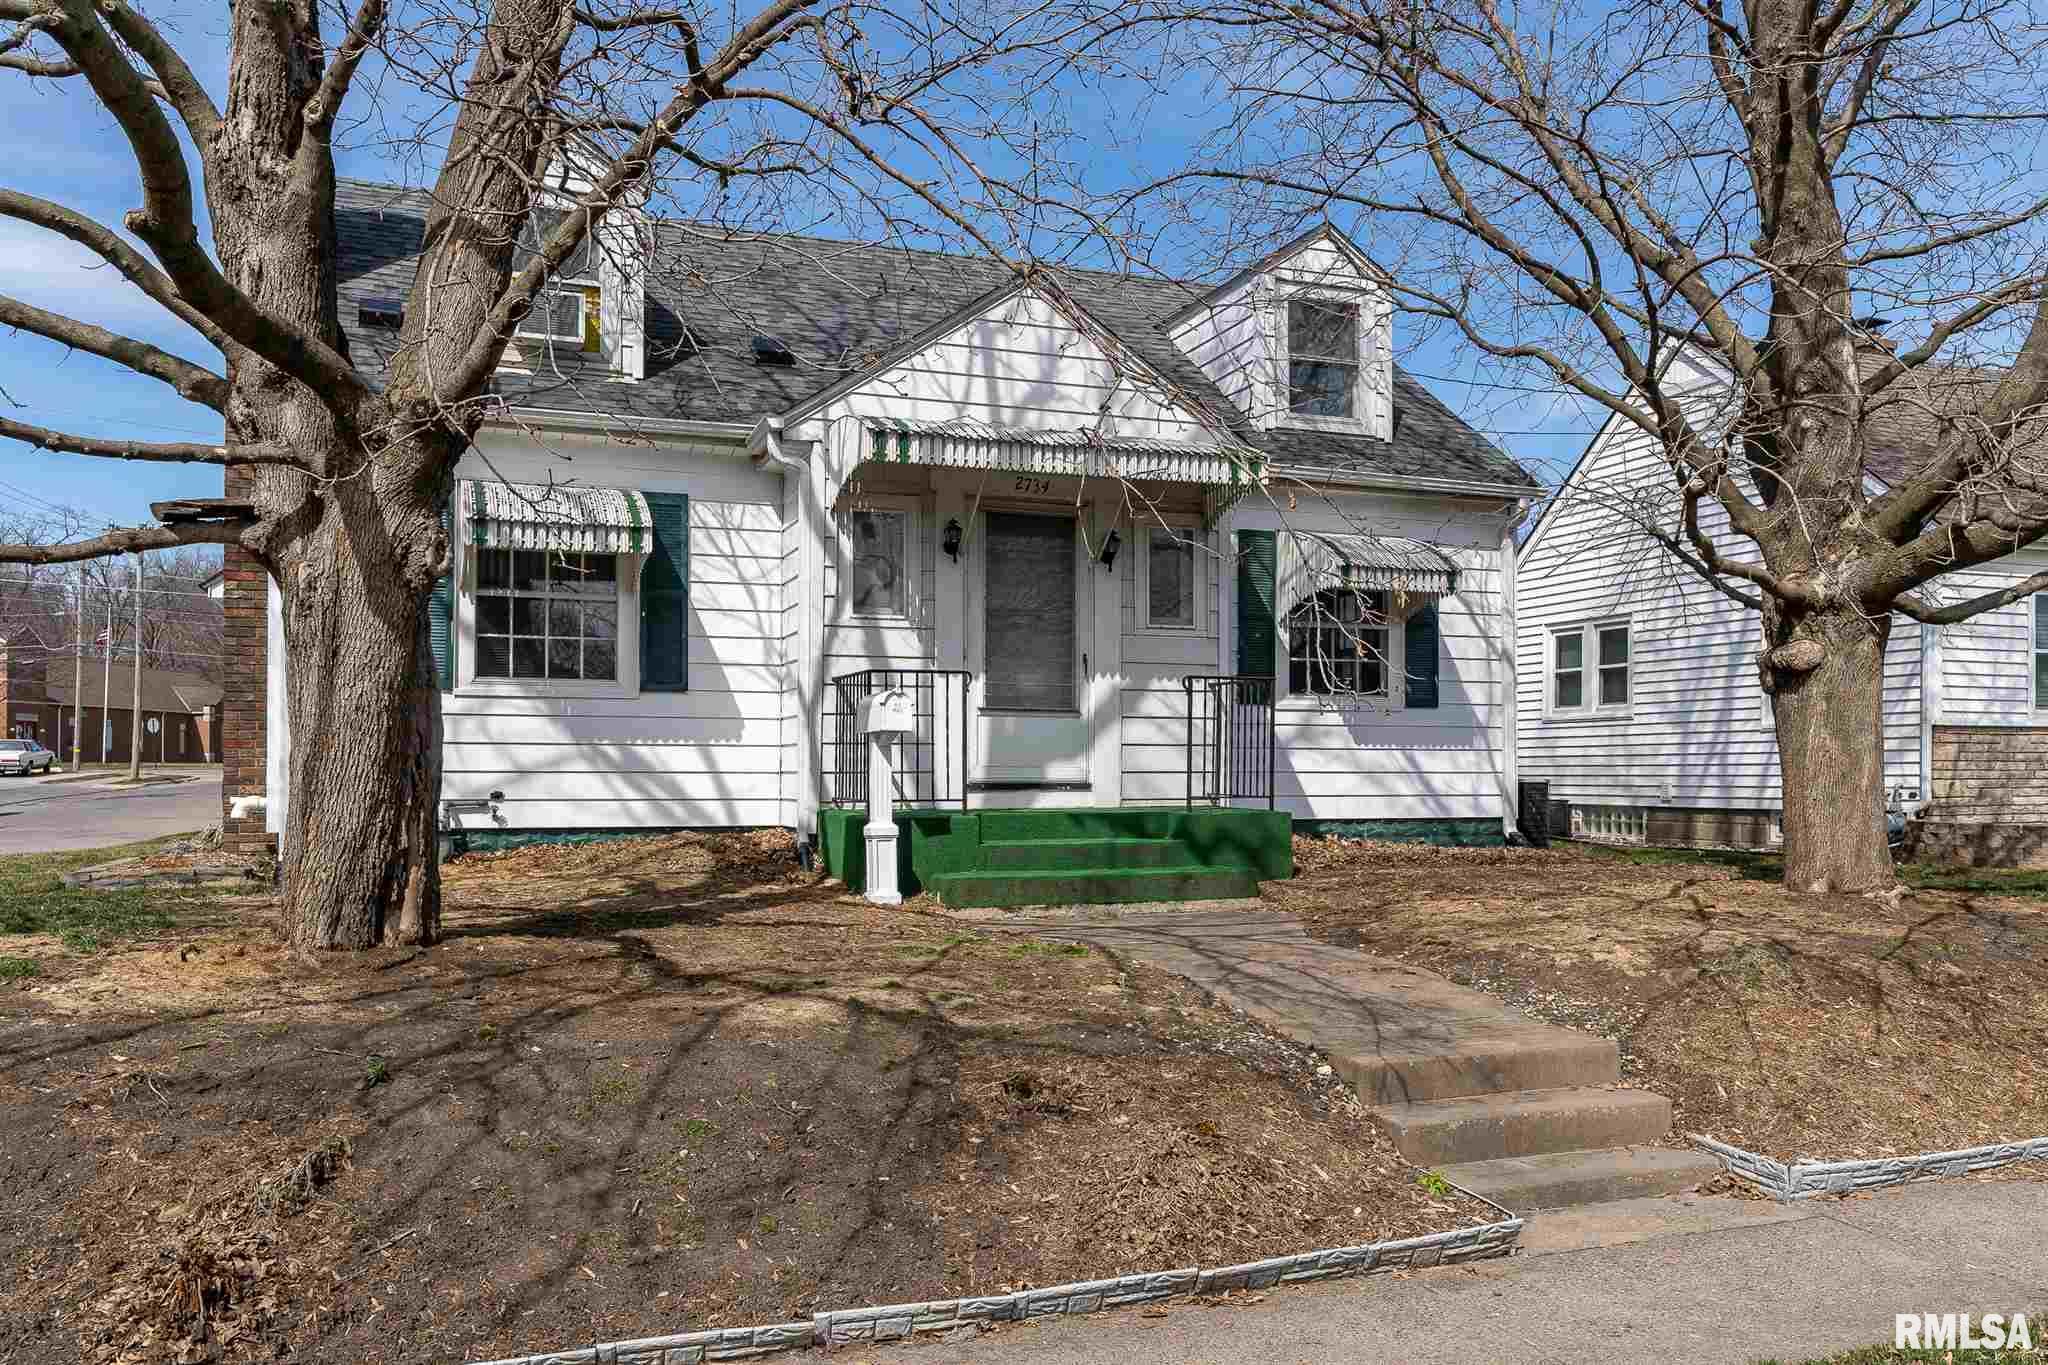 2734 WHITEWOOD Property Photo - Davenport, IA real estate listing